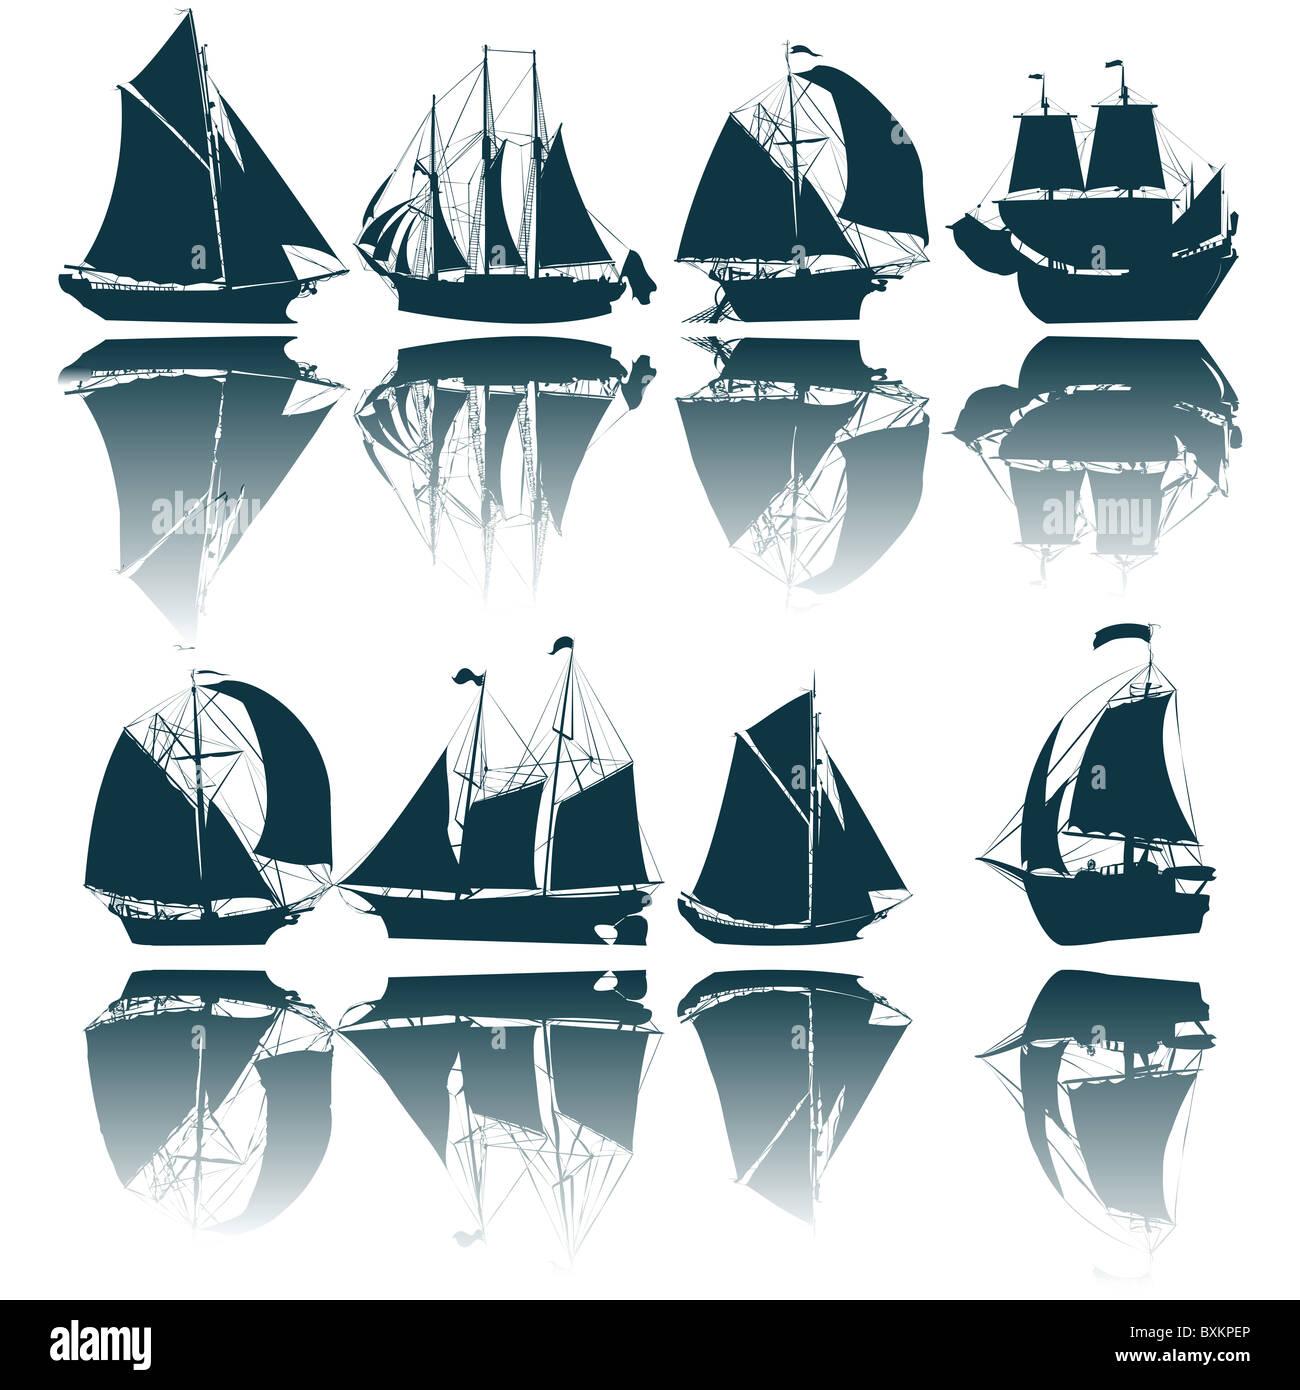 Sailing ship silhouettes - Stock Image